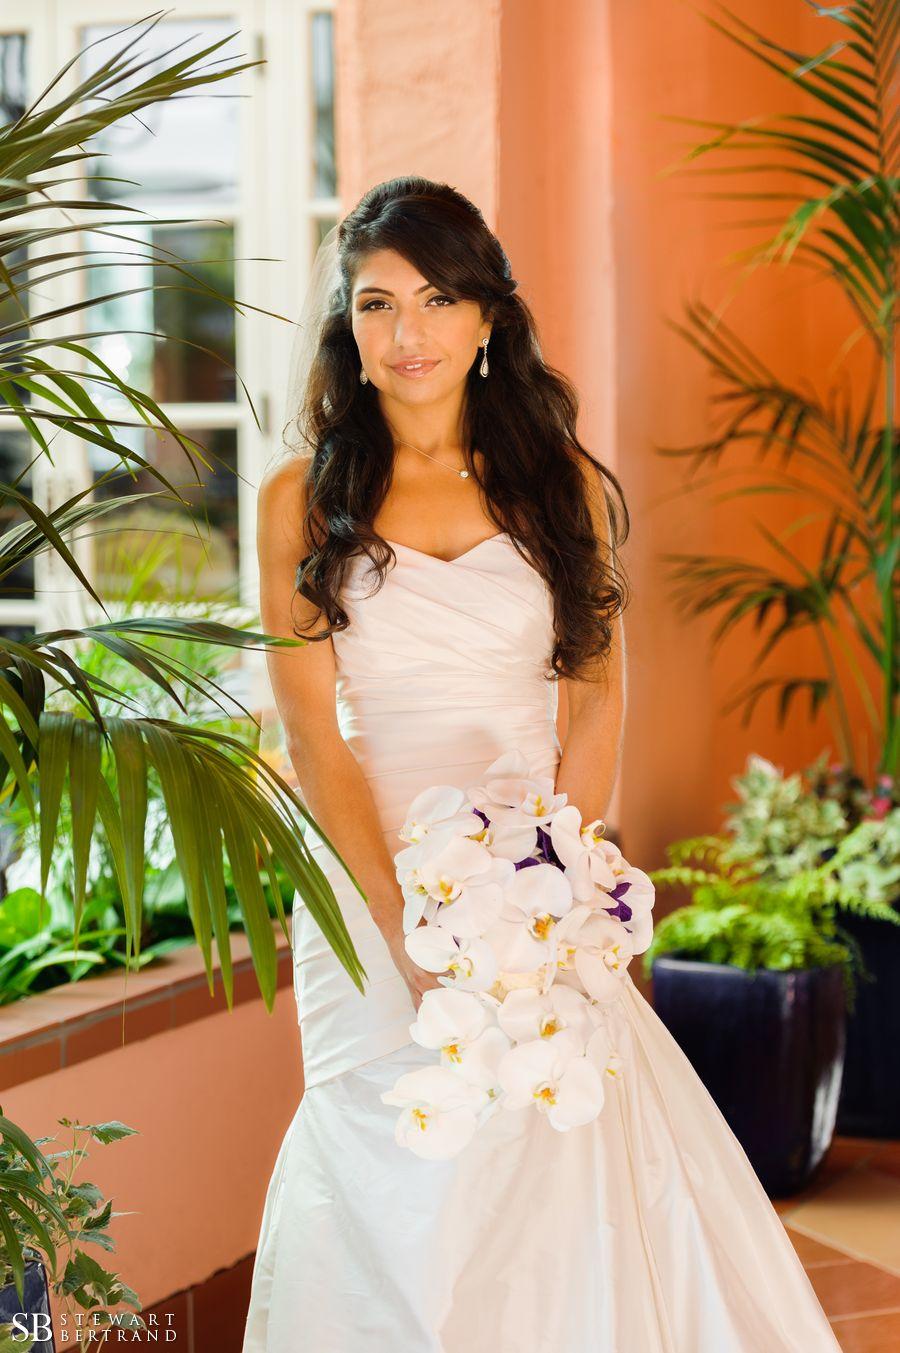 0053-La-Valencia-Wedding-Stewart-Bertrand-Photography-fe13.jpg